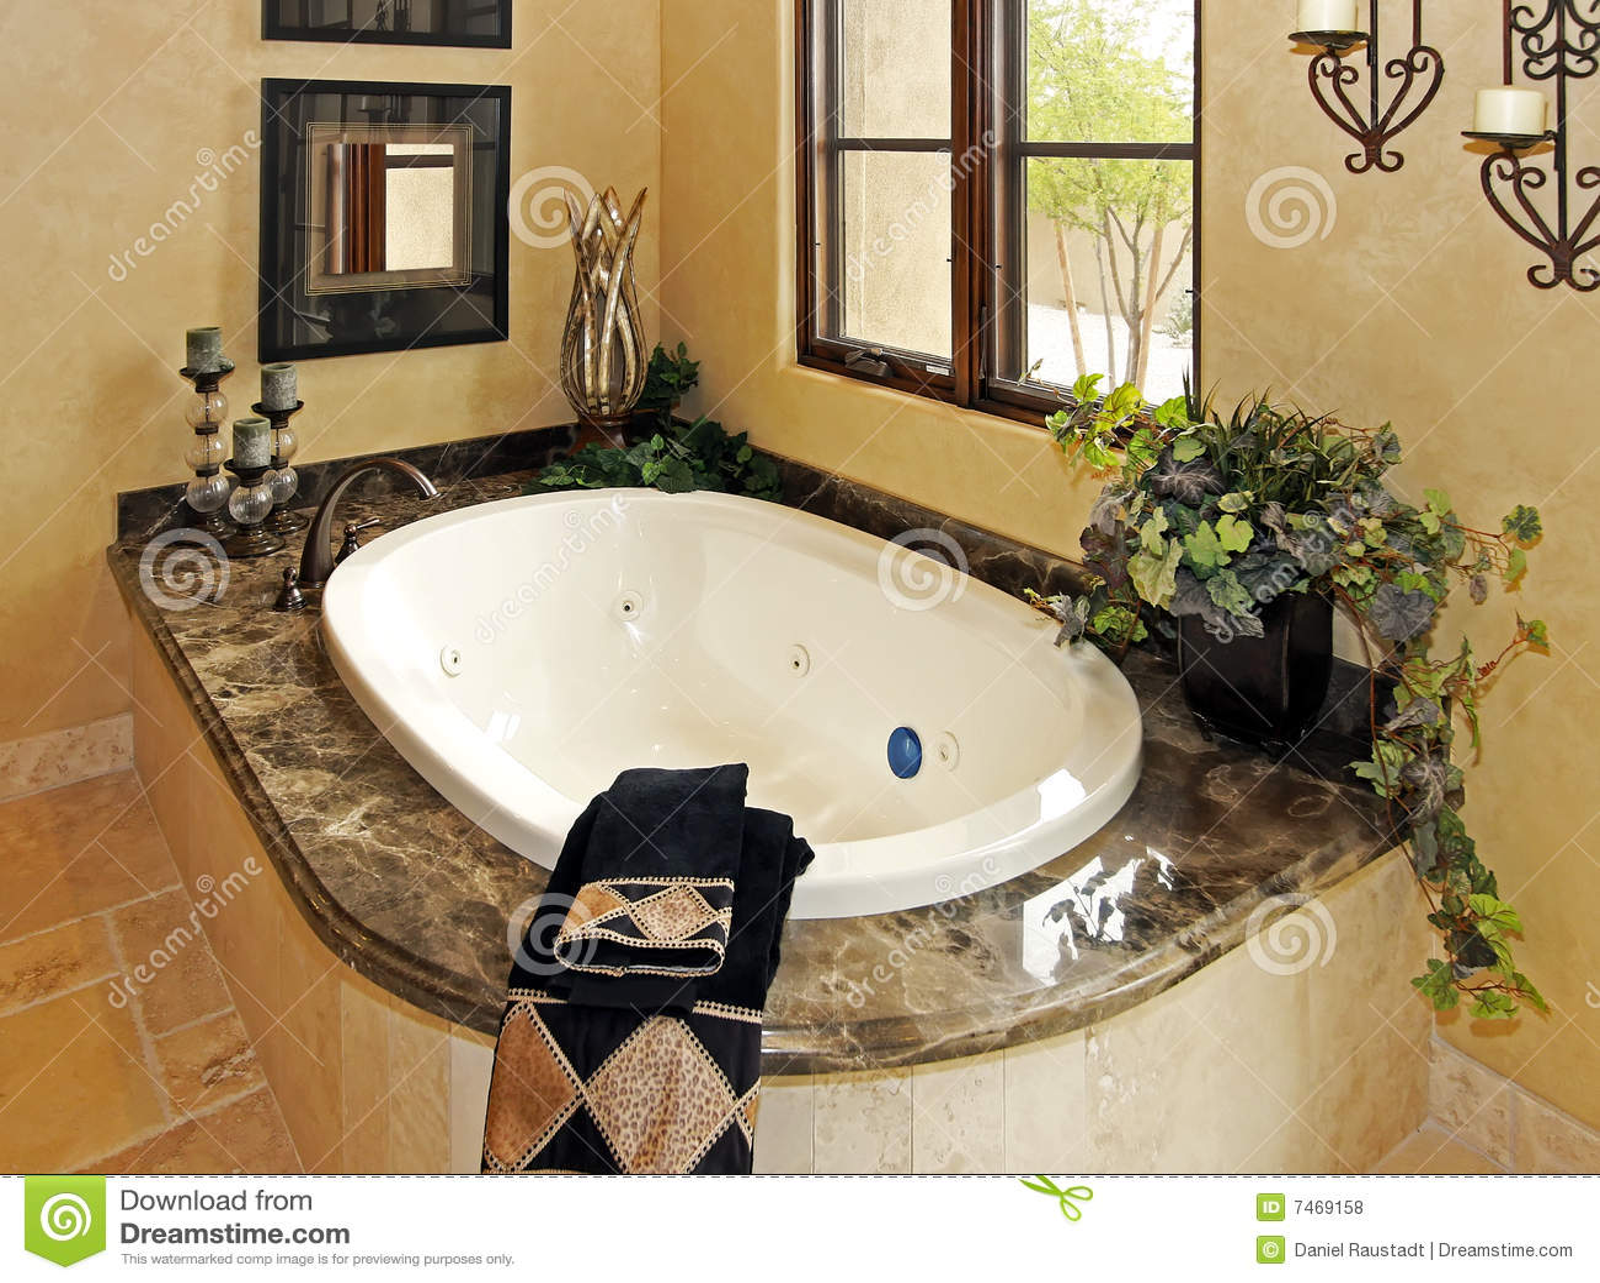 Resort mansion bathroom spa tub Royalty Free Stock Photos. Resort Mansion Bathroom Spa Royalty Free Stock Photo   Image  7469215